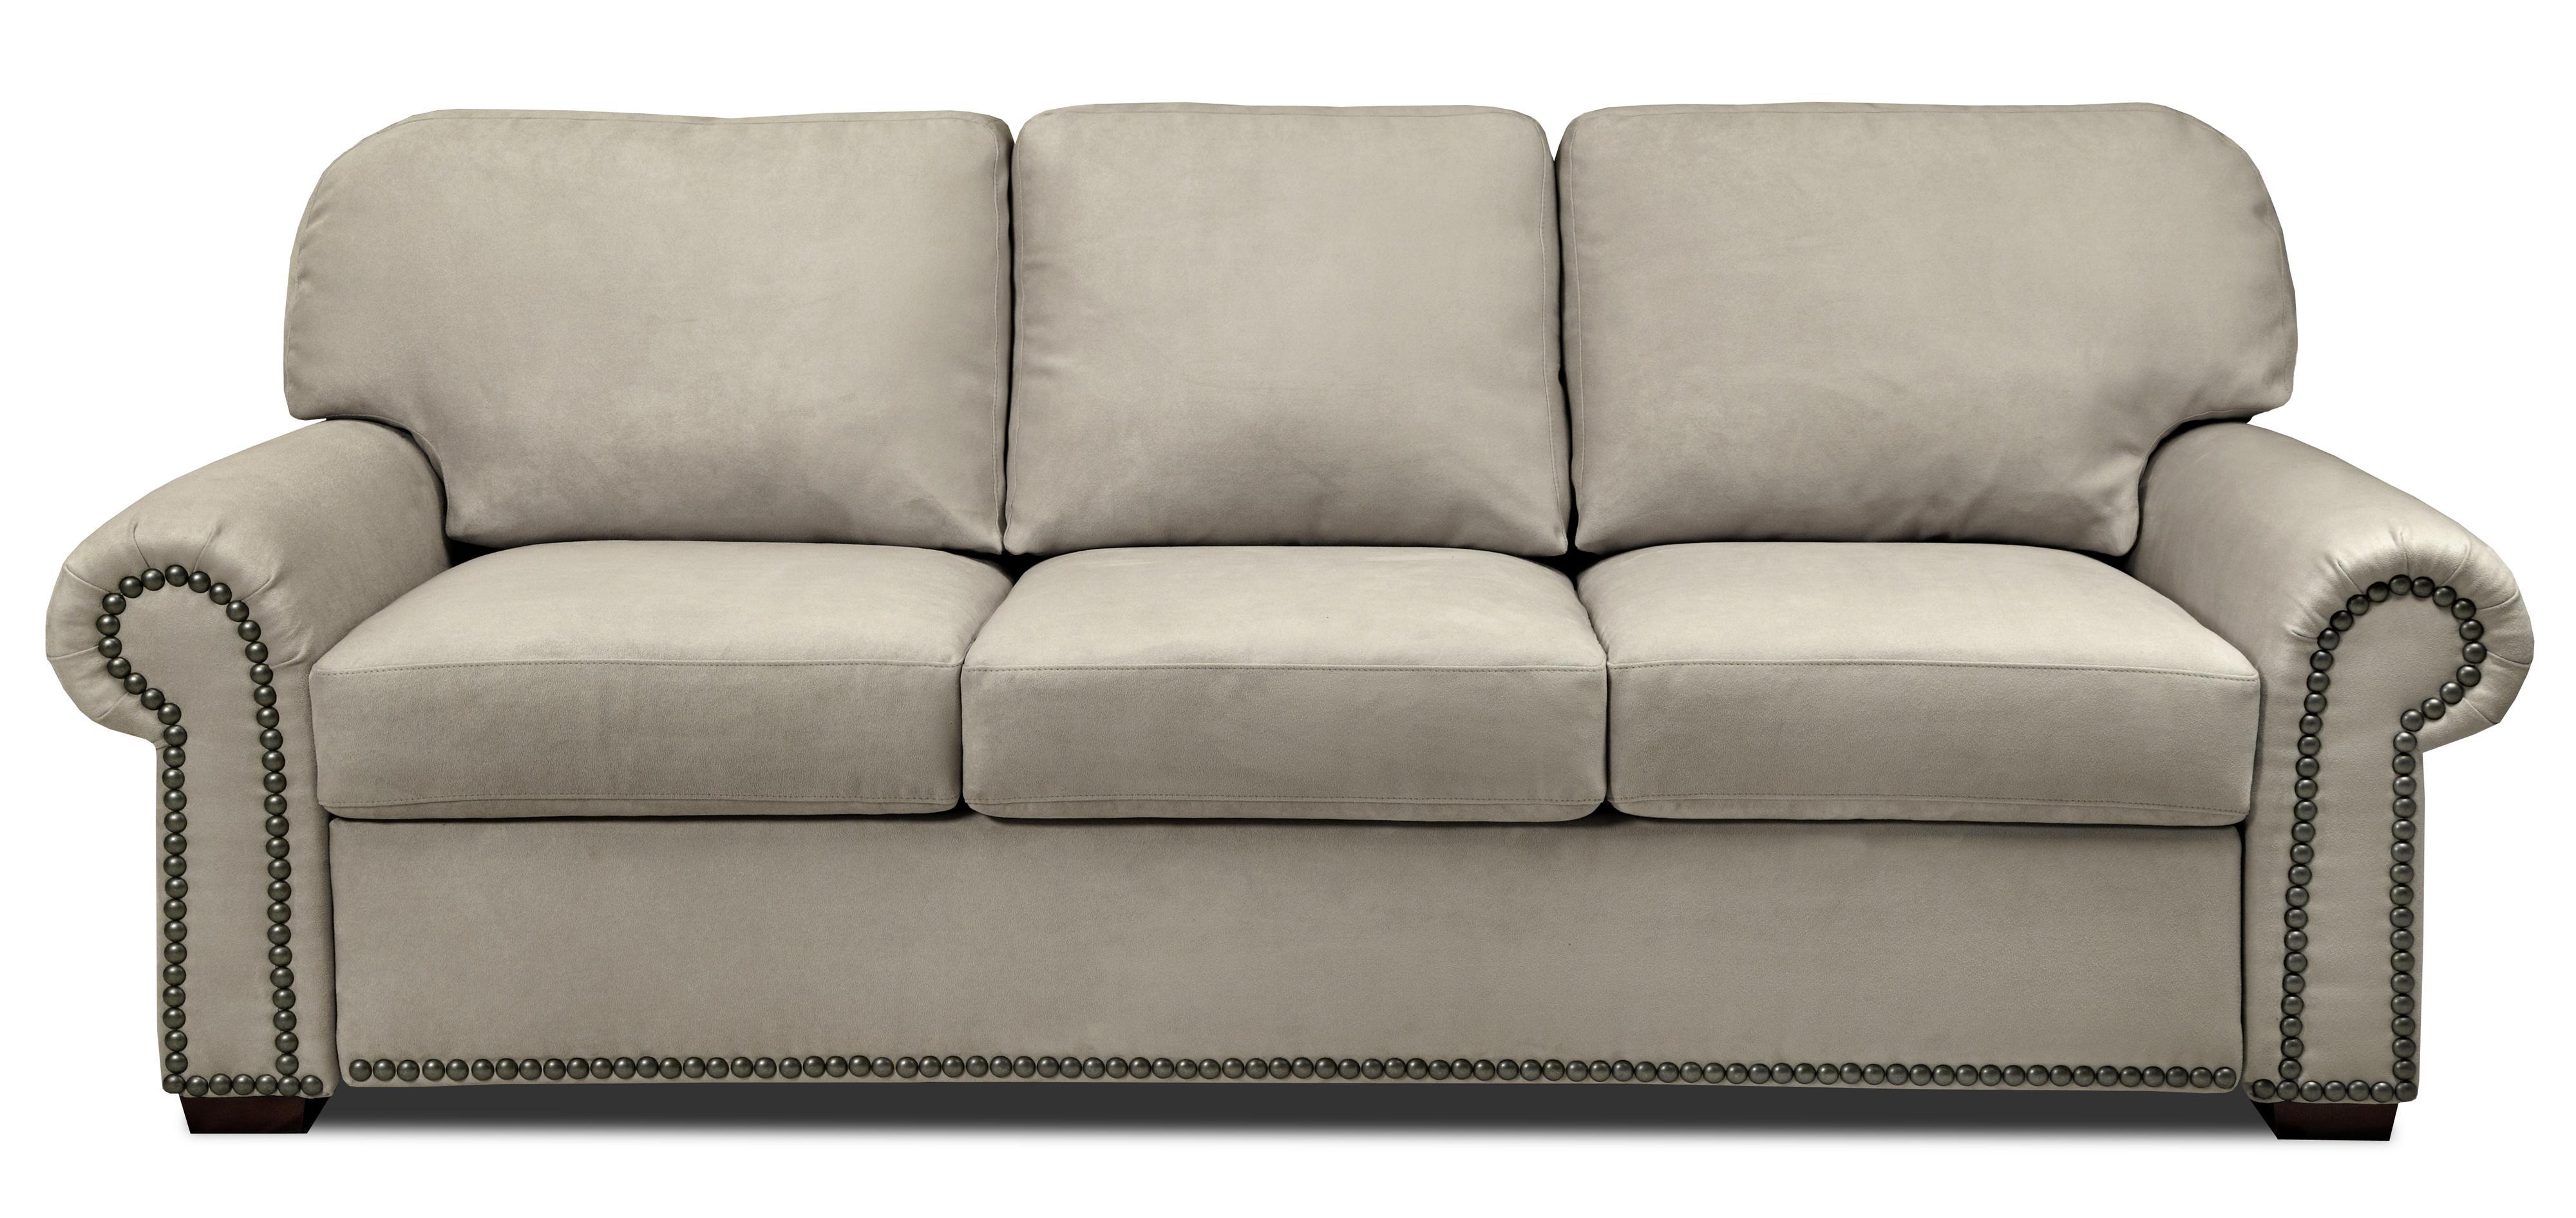 comfort sleeper comforter san leather bedroom perry more american sofa